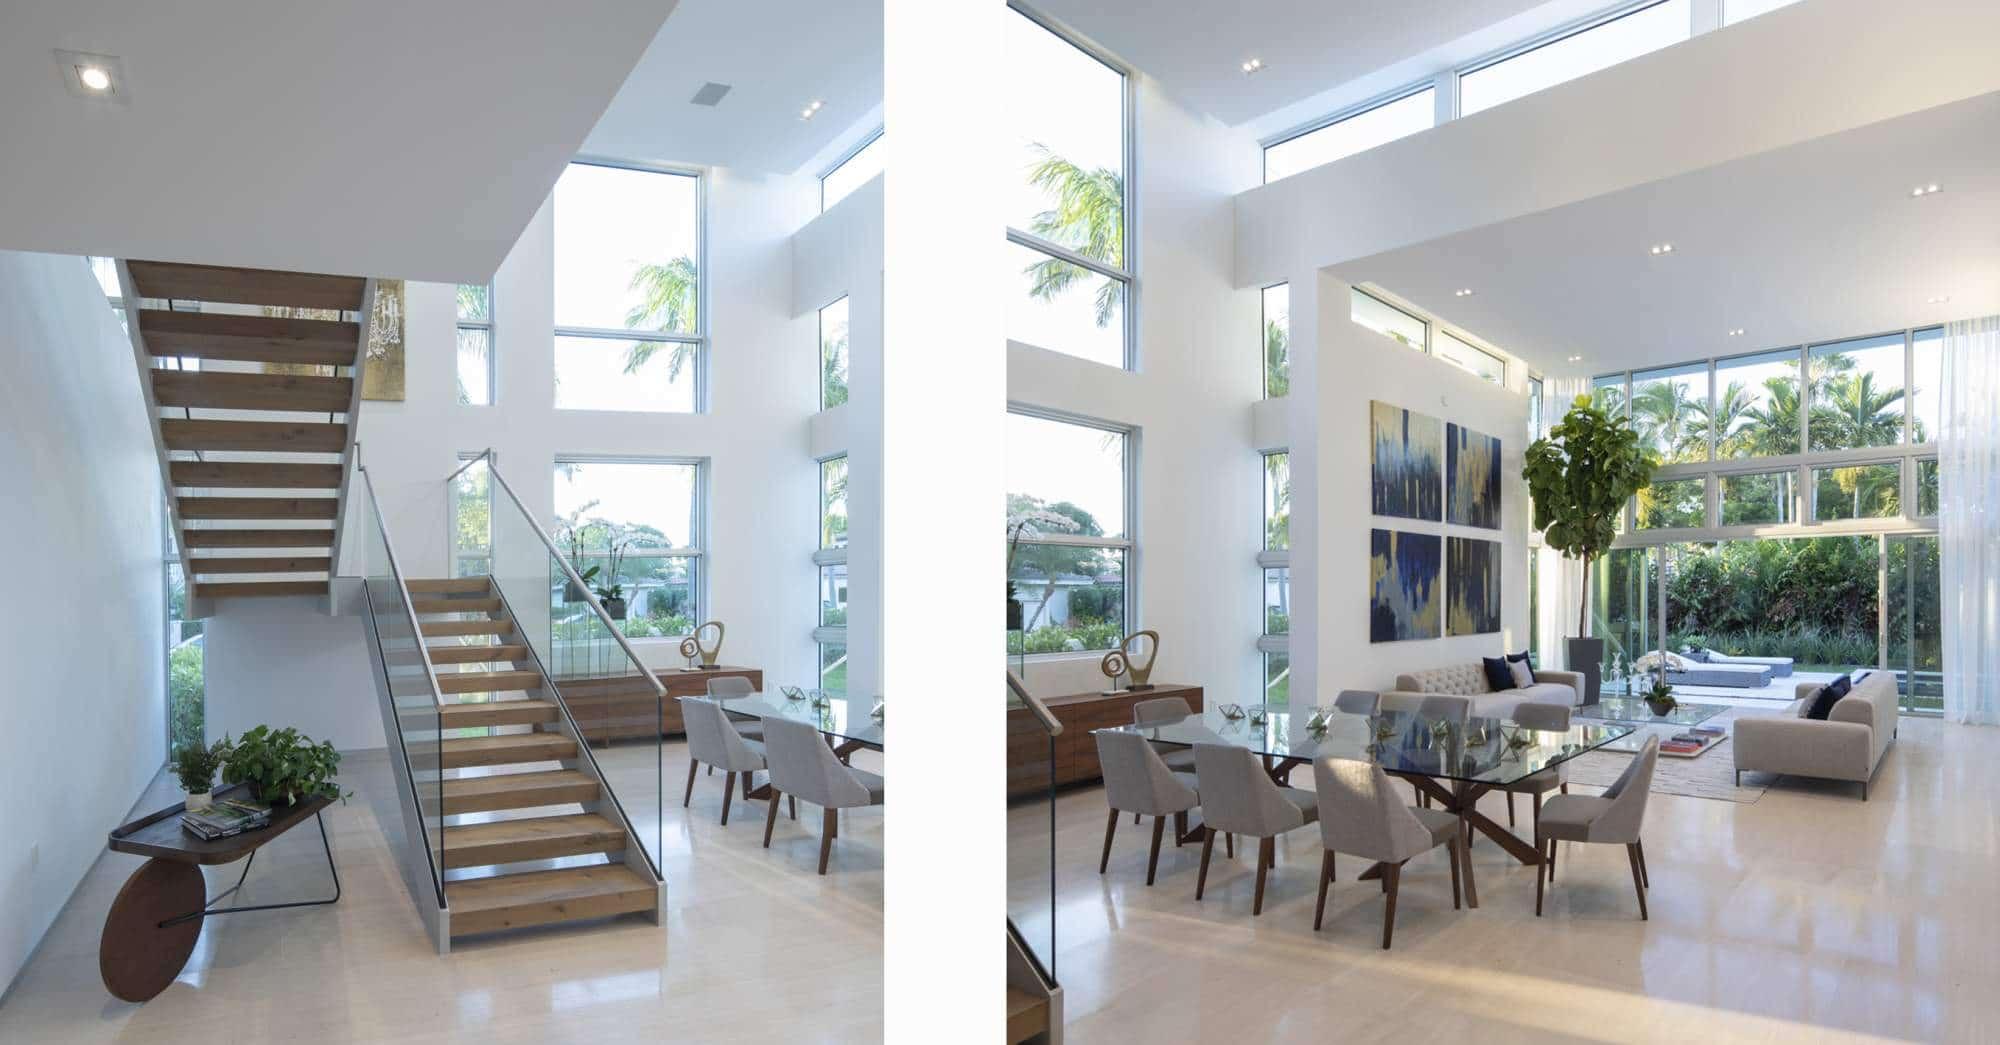 Interior Design Architecture project in 77 Bal Harbour, Florida